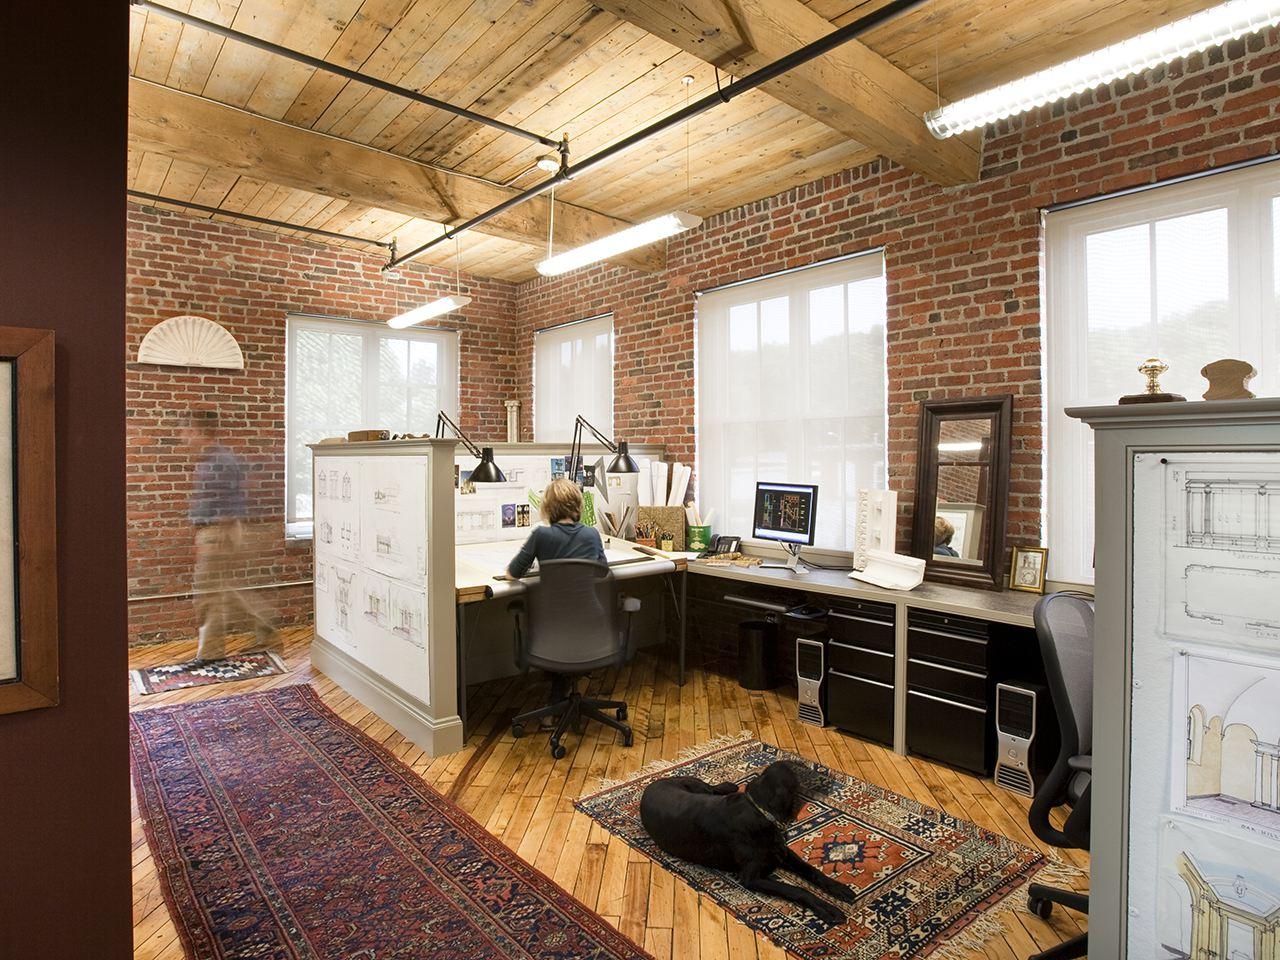 Architect Studio